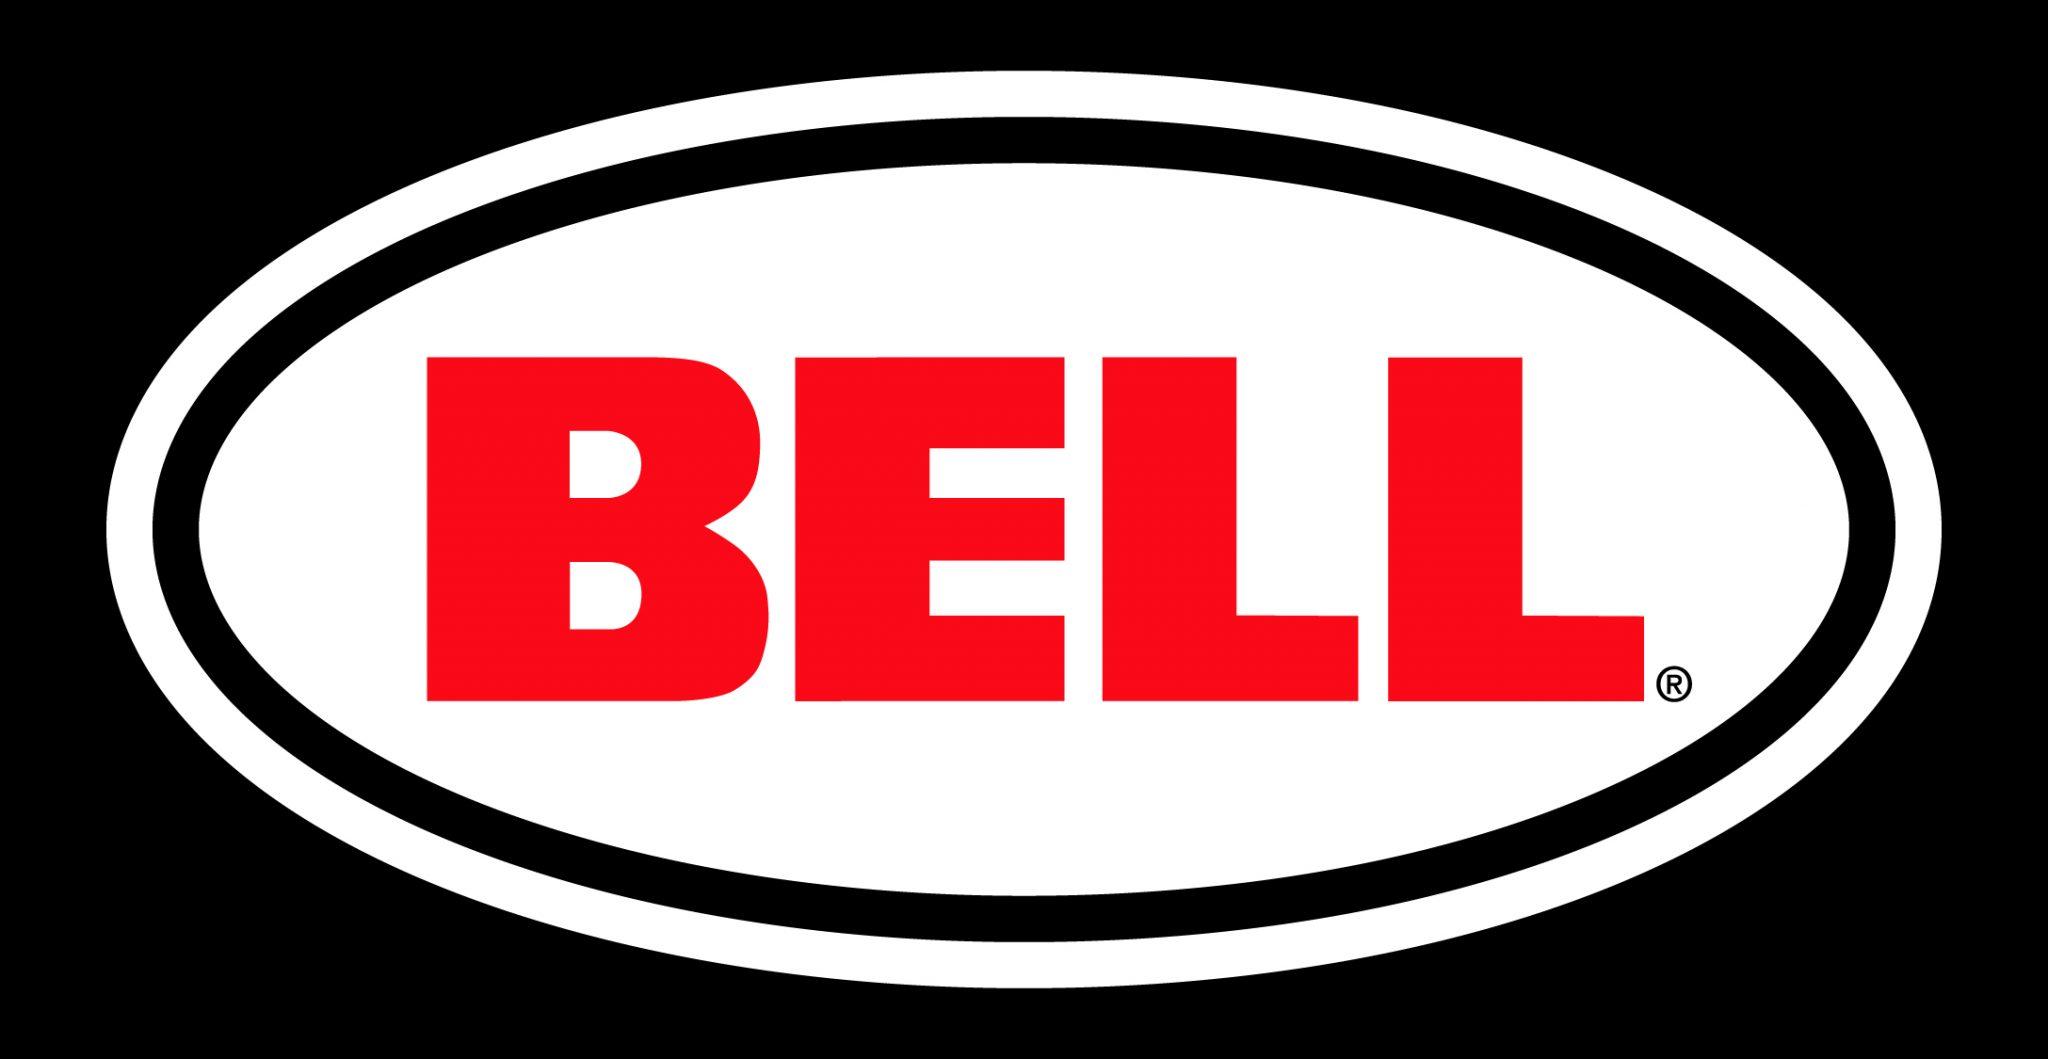 bell-racing-logo